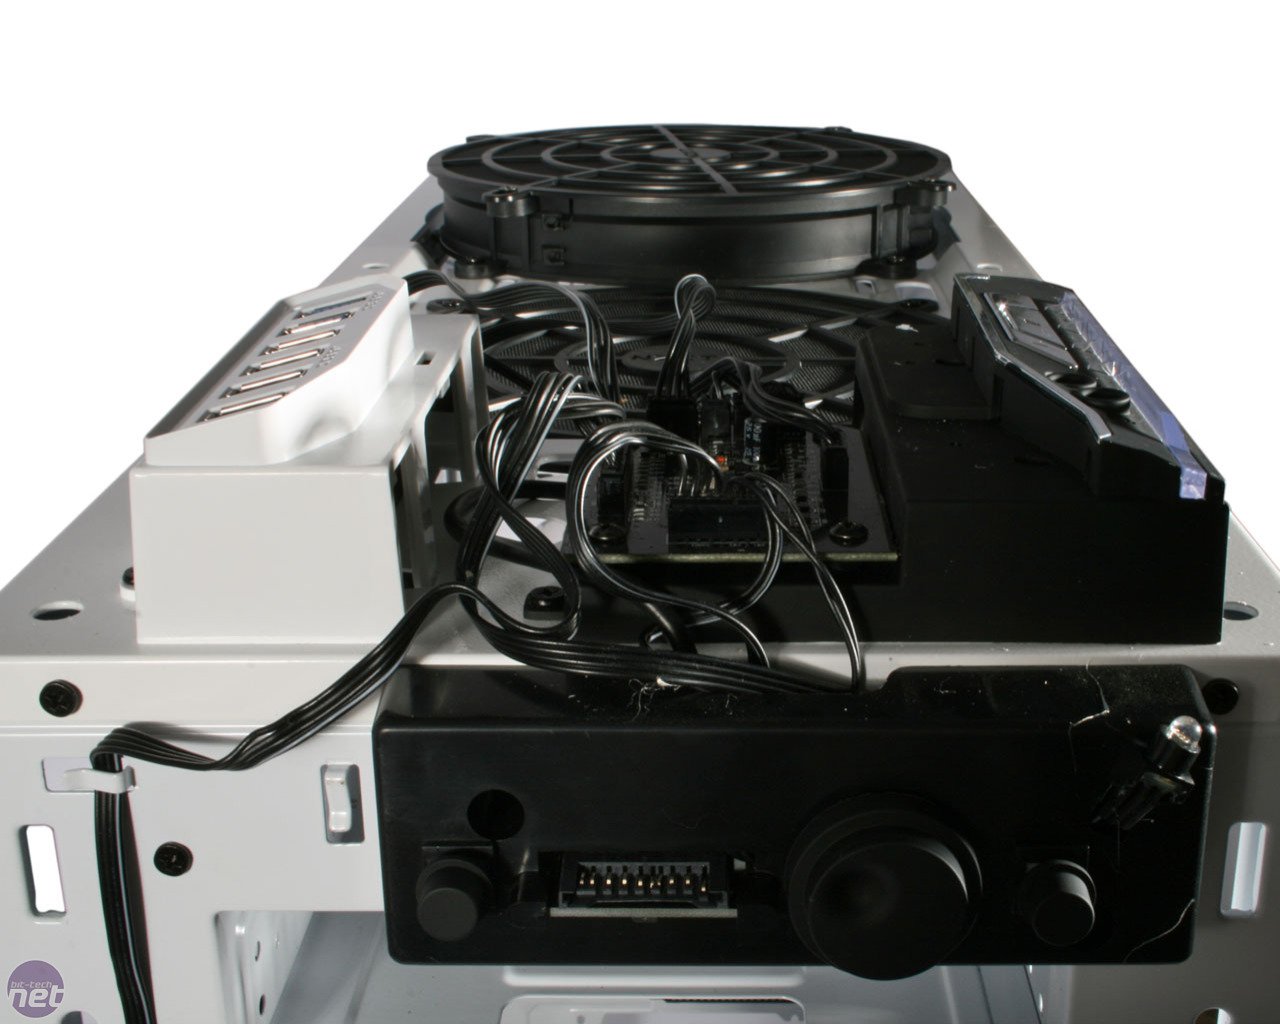 Nzxt Phantom 410 Wiring Diagram Auto Electrical Rover 820 Usb 3 0 Upgrade